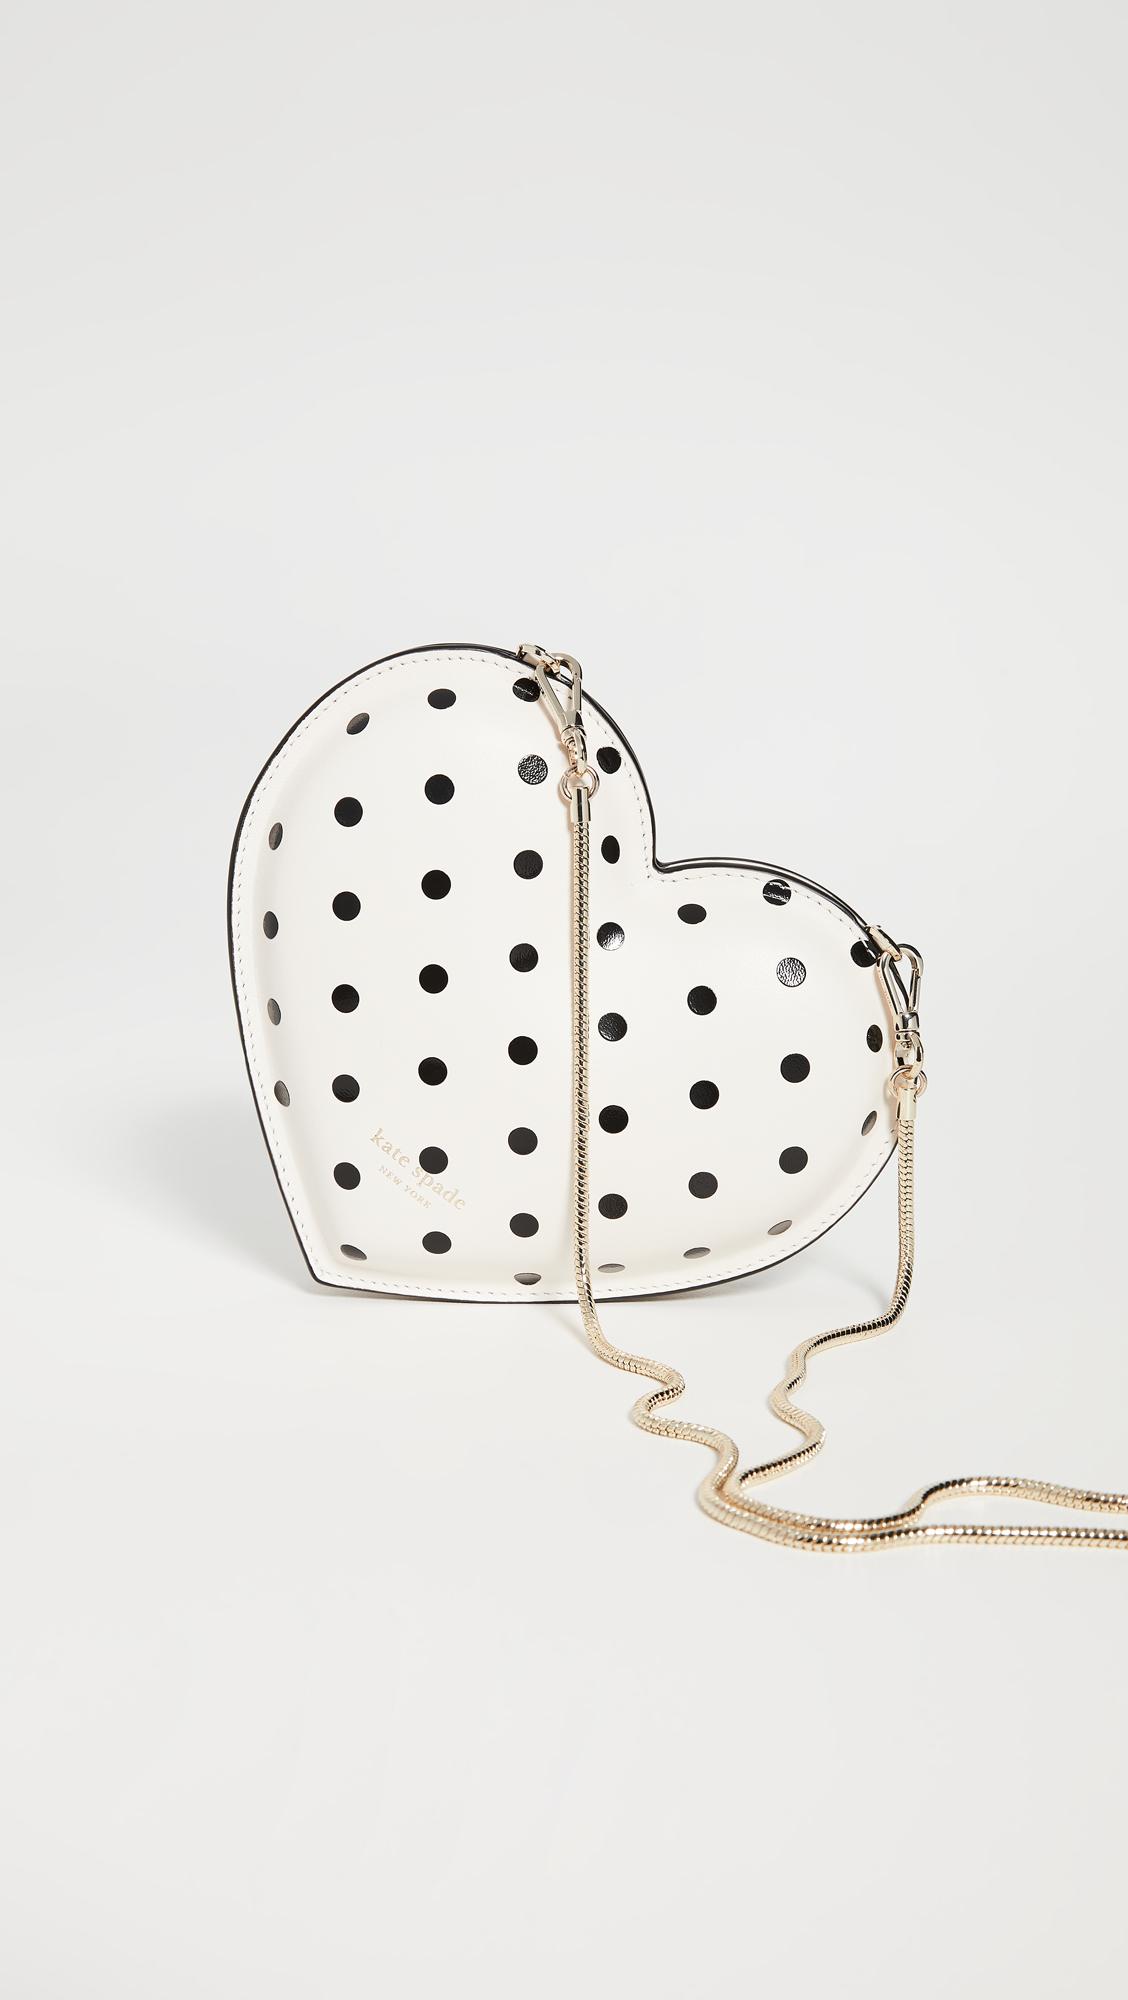 Kate Spade New York Cabana Dot Heart Crossbody Bag